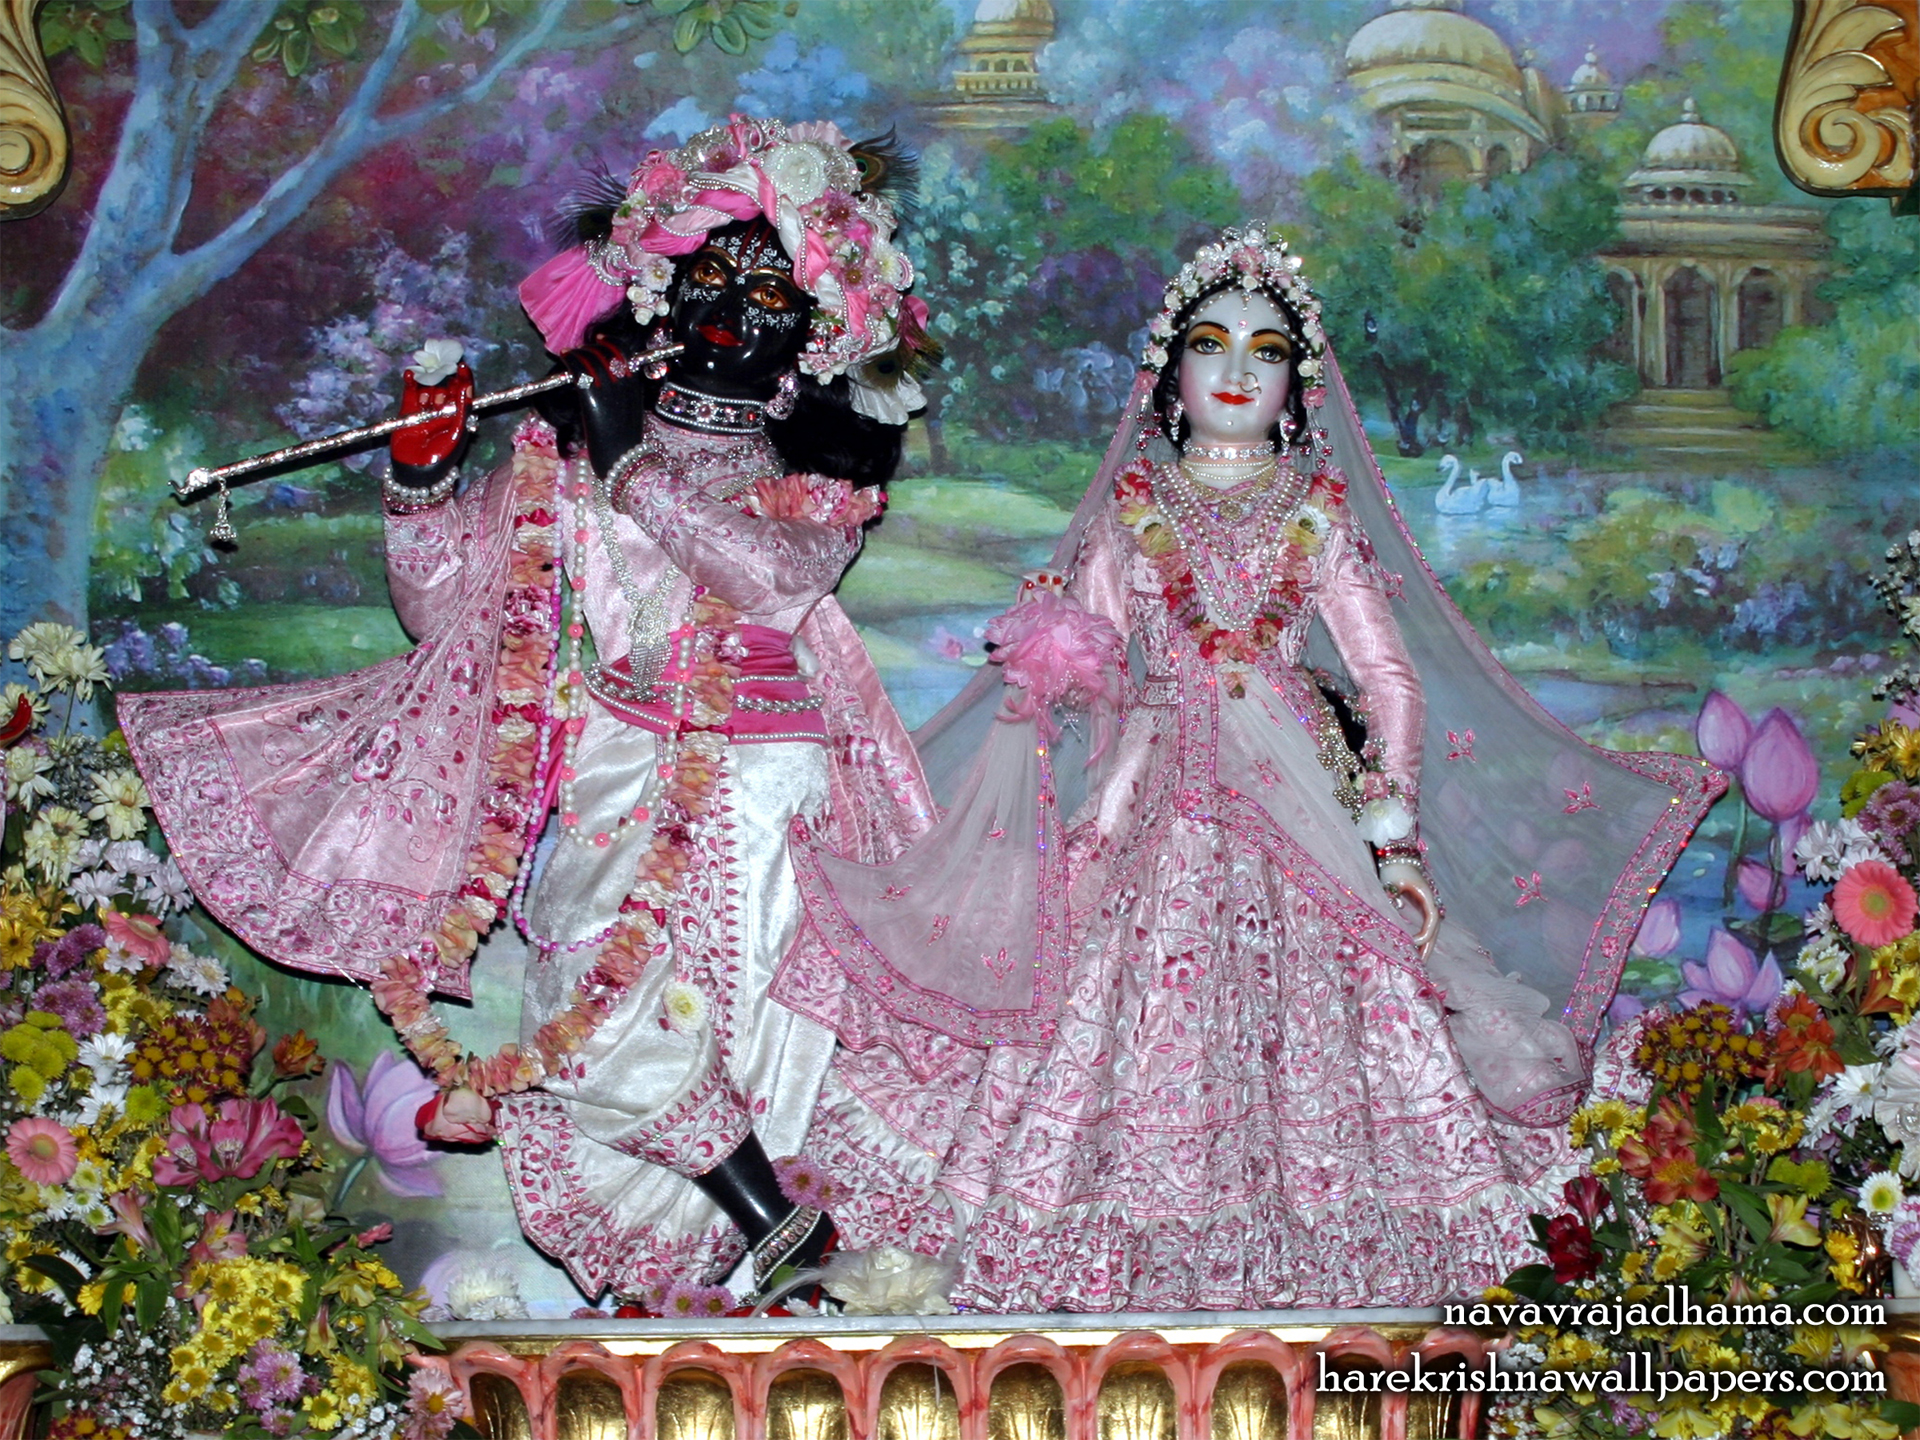 Sri Sri Radha Shyamsundar Wallpaper (011) Size 1920x1440 Download